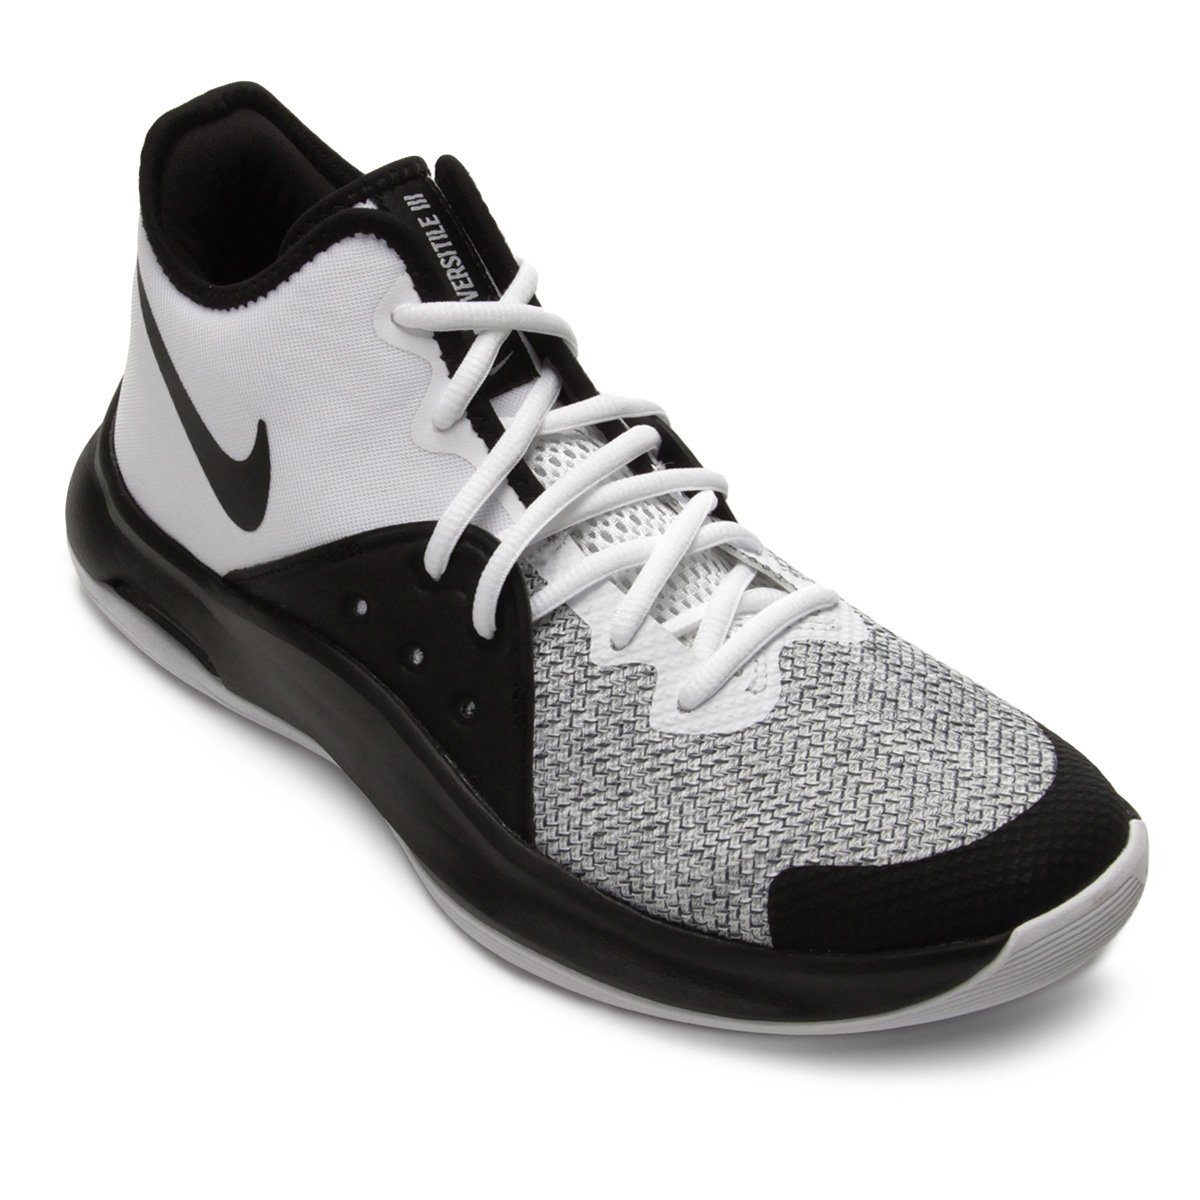 1b47859c279 Tênis Nike Air Versitile III Masculino - Branco e Preto - Compre Agora